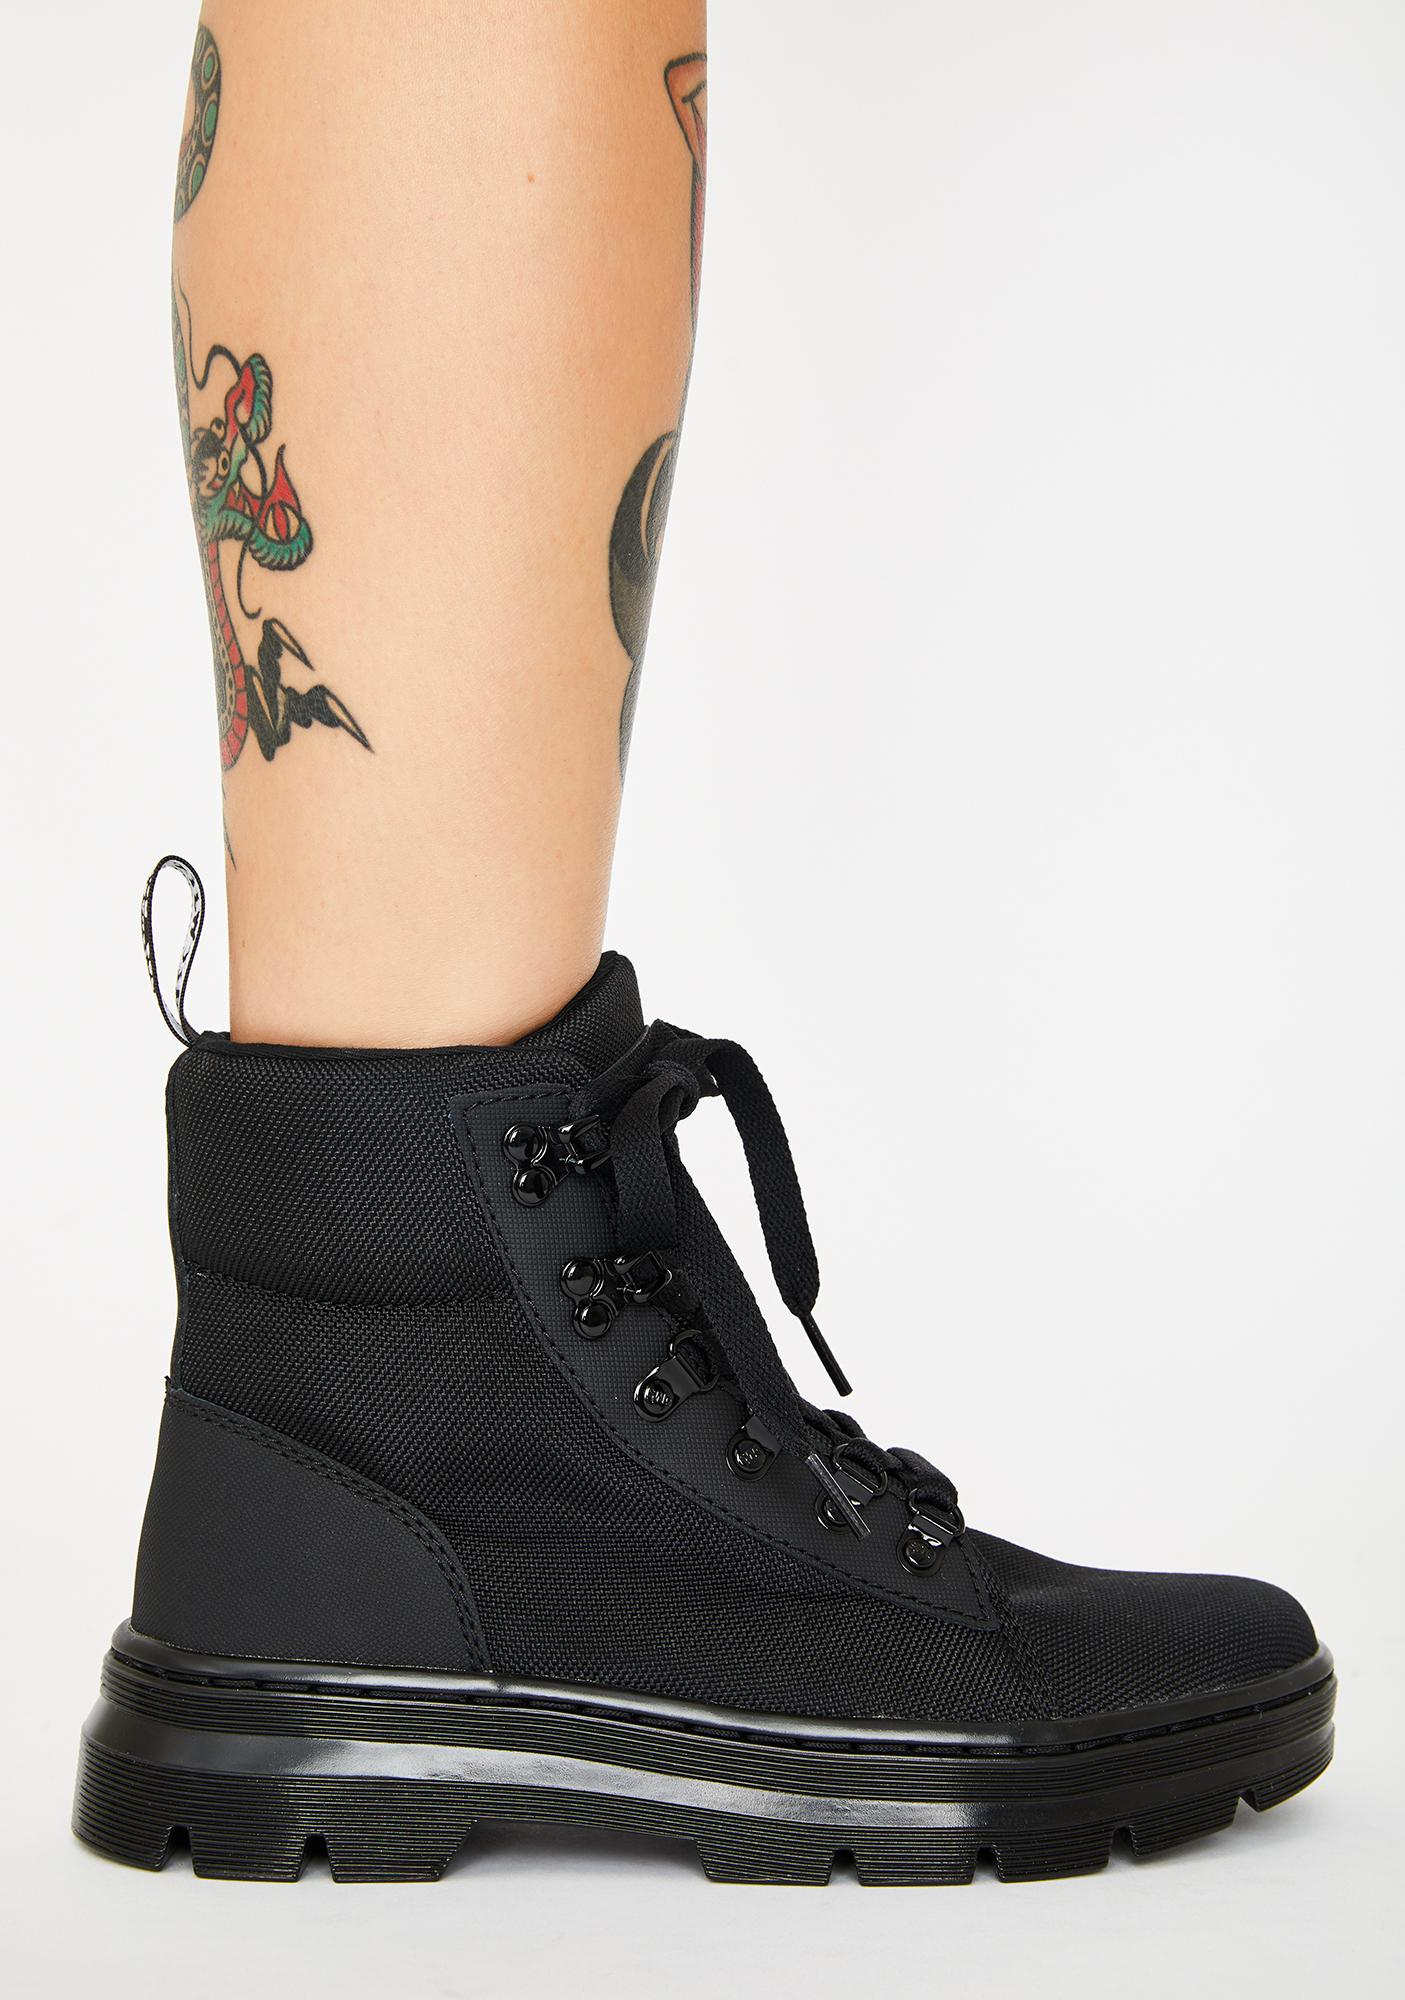 Dr. Martens Women's Combs Combat Boots